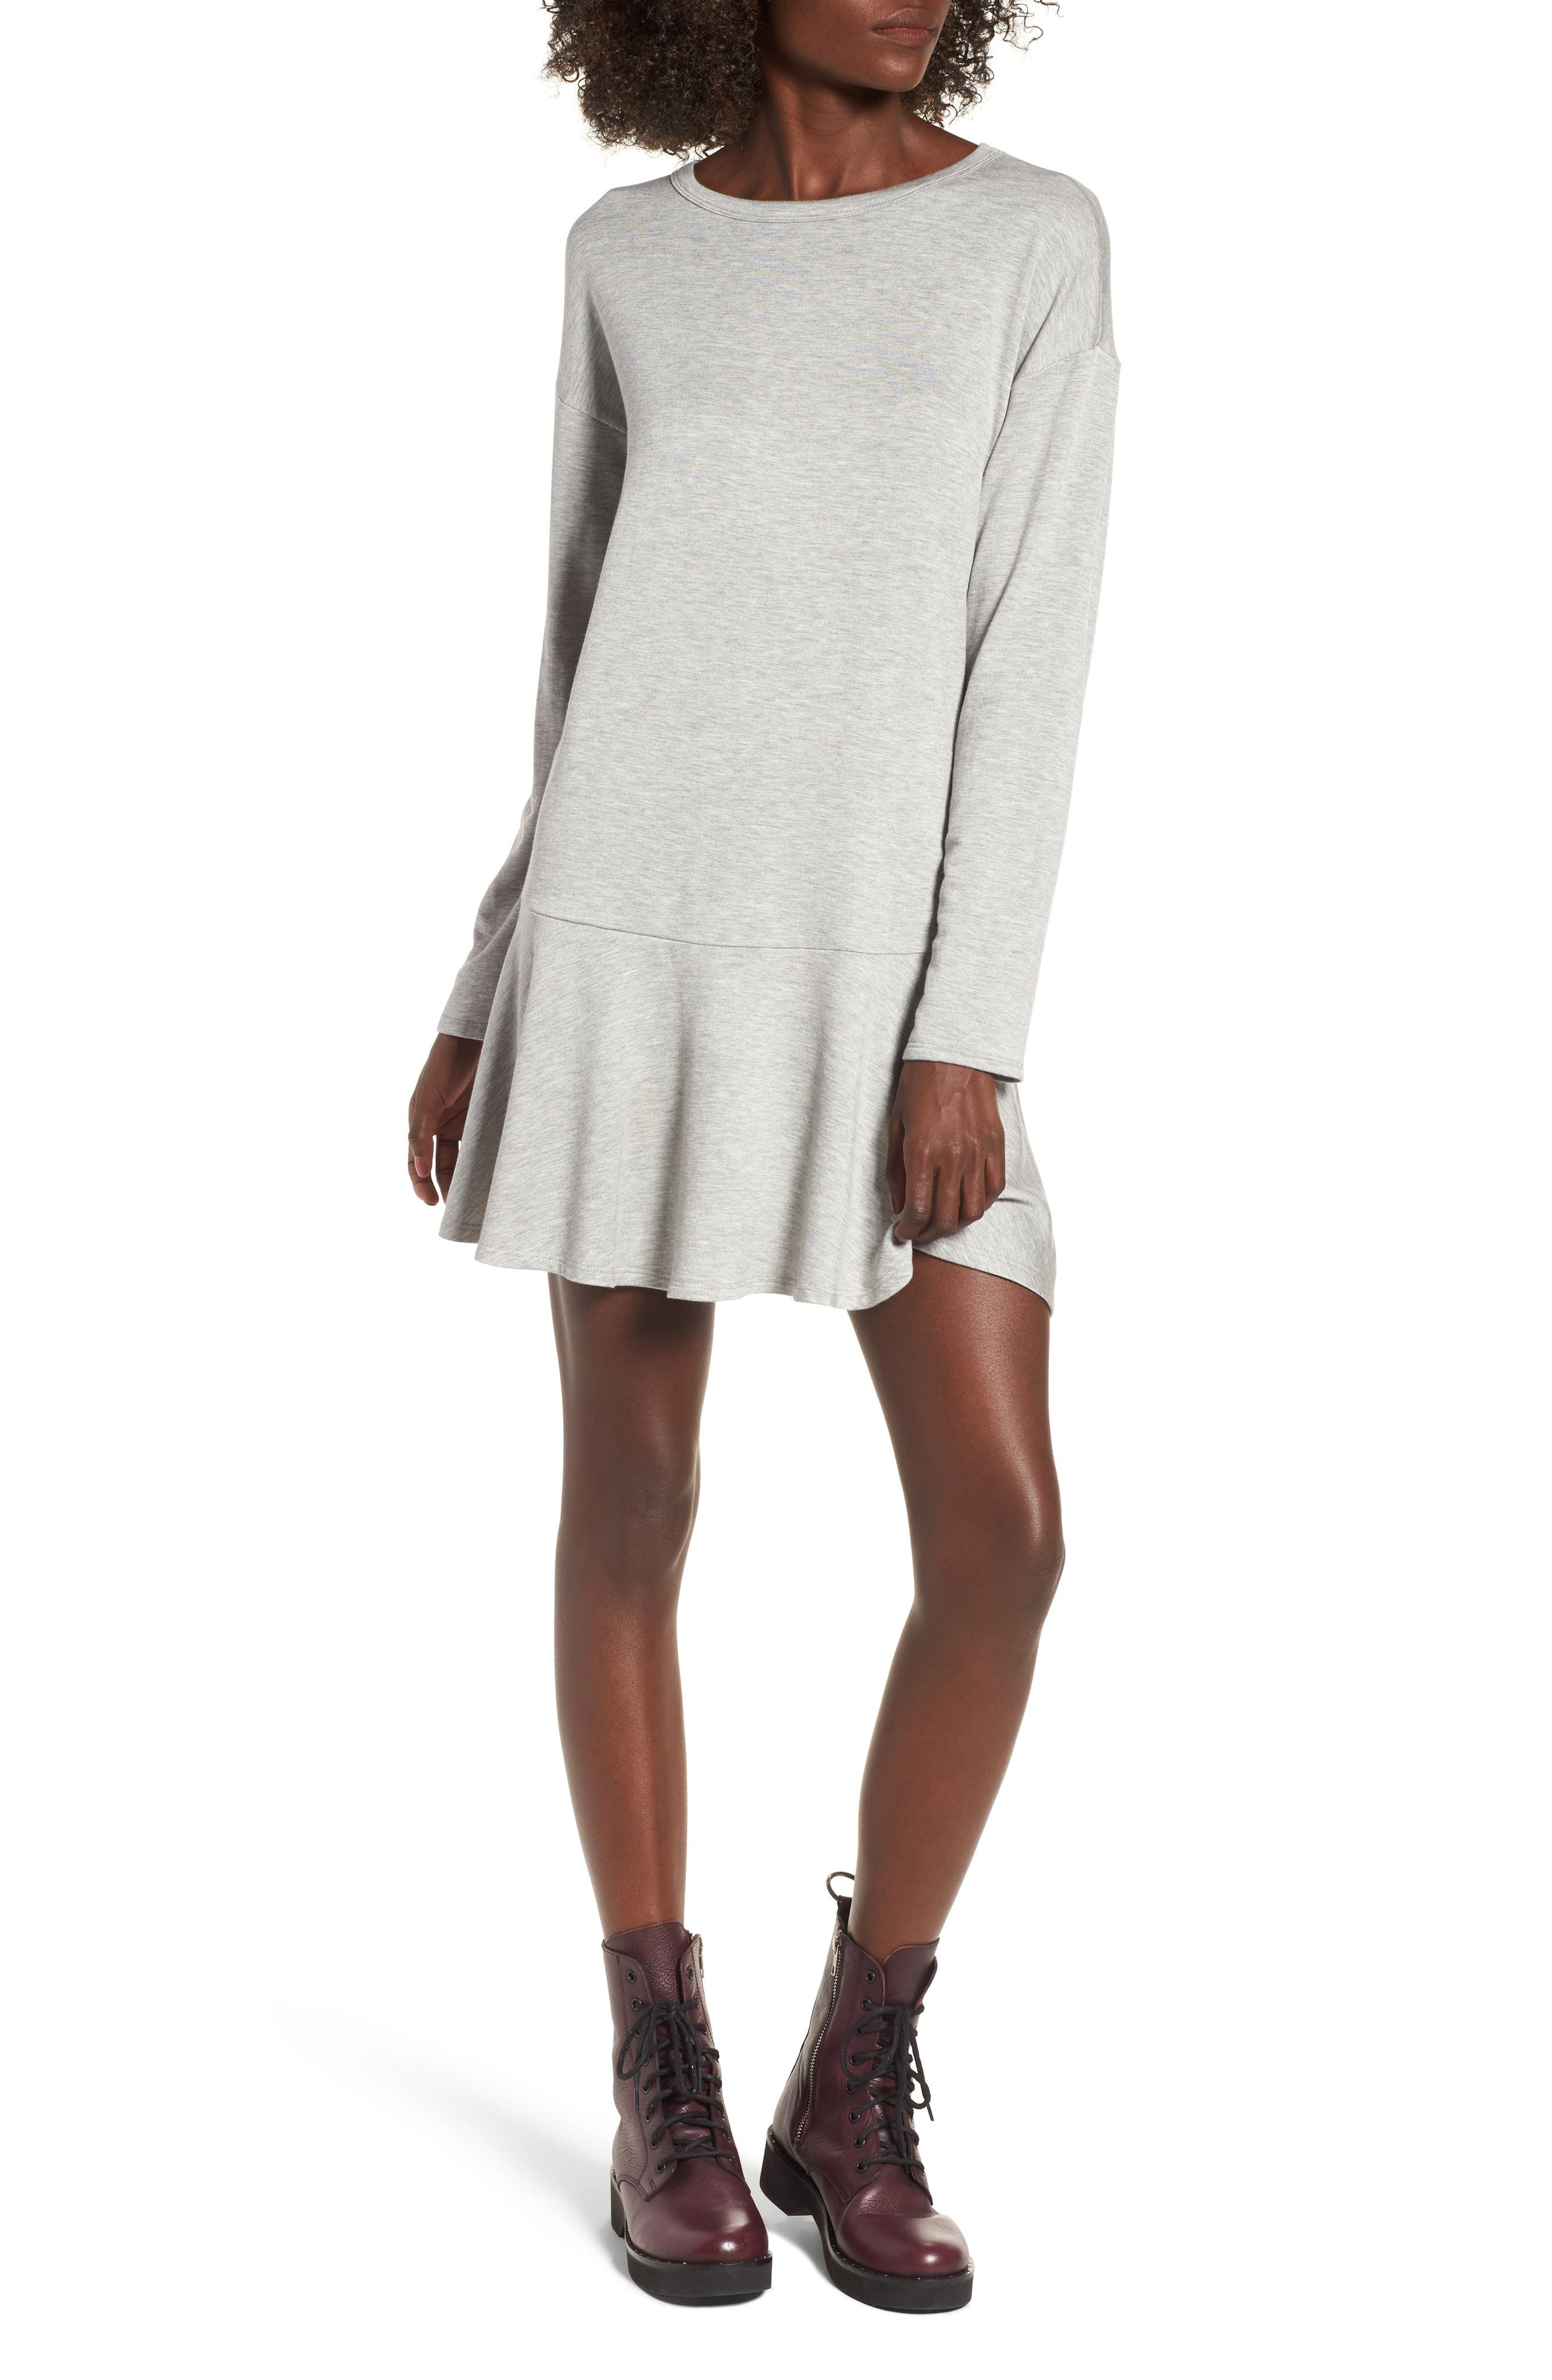 Socialite Drop Waist Sweatshirt Dress